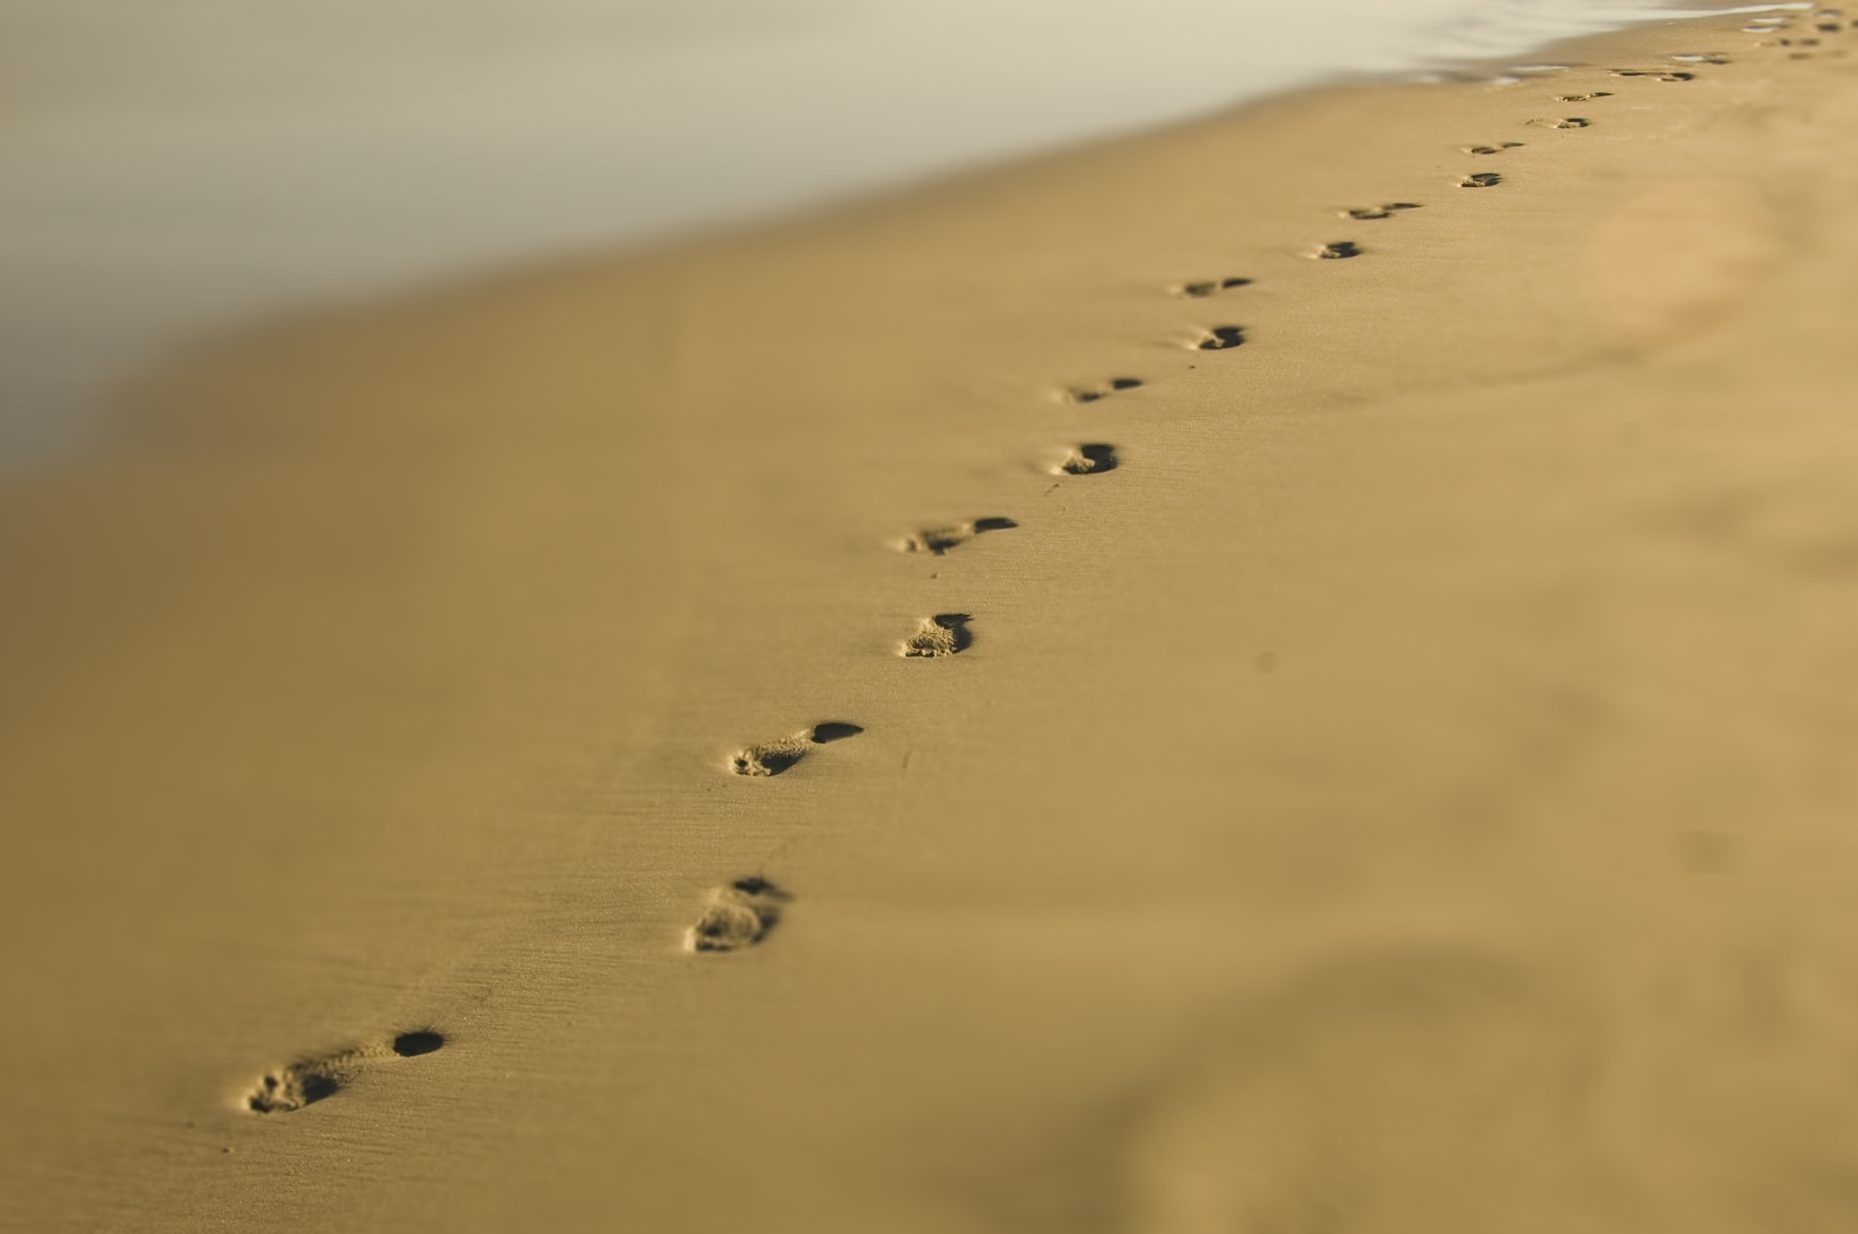 Footprints on abeach